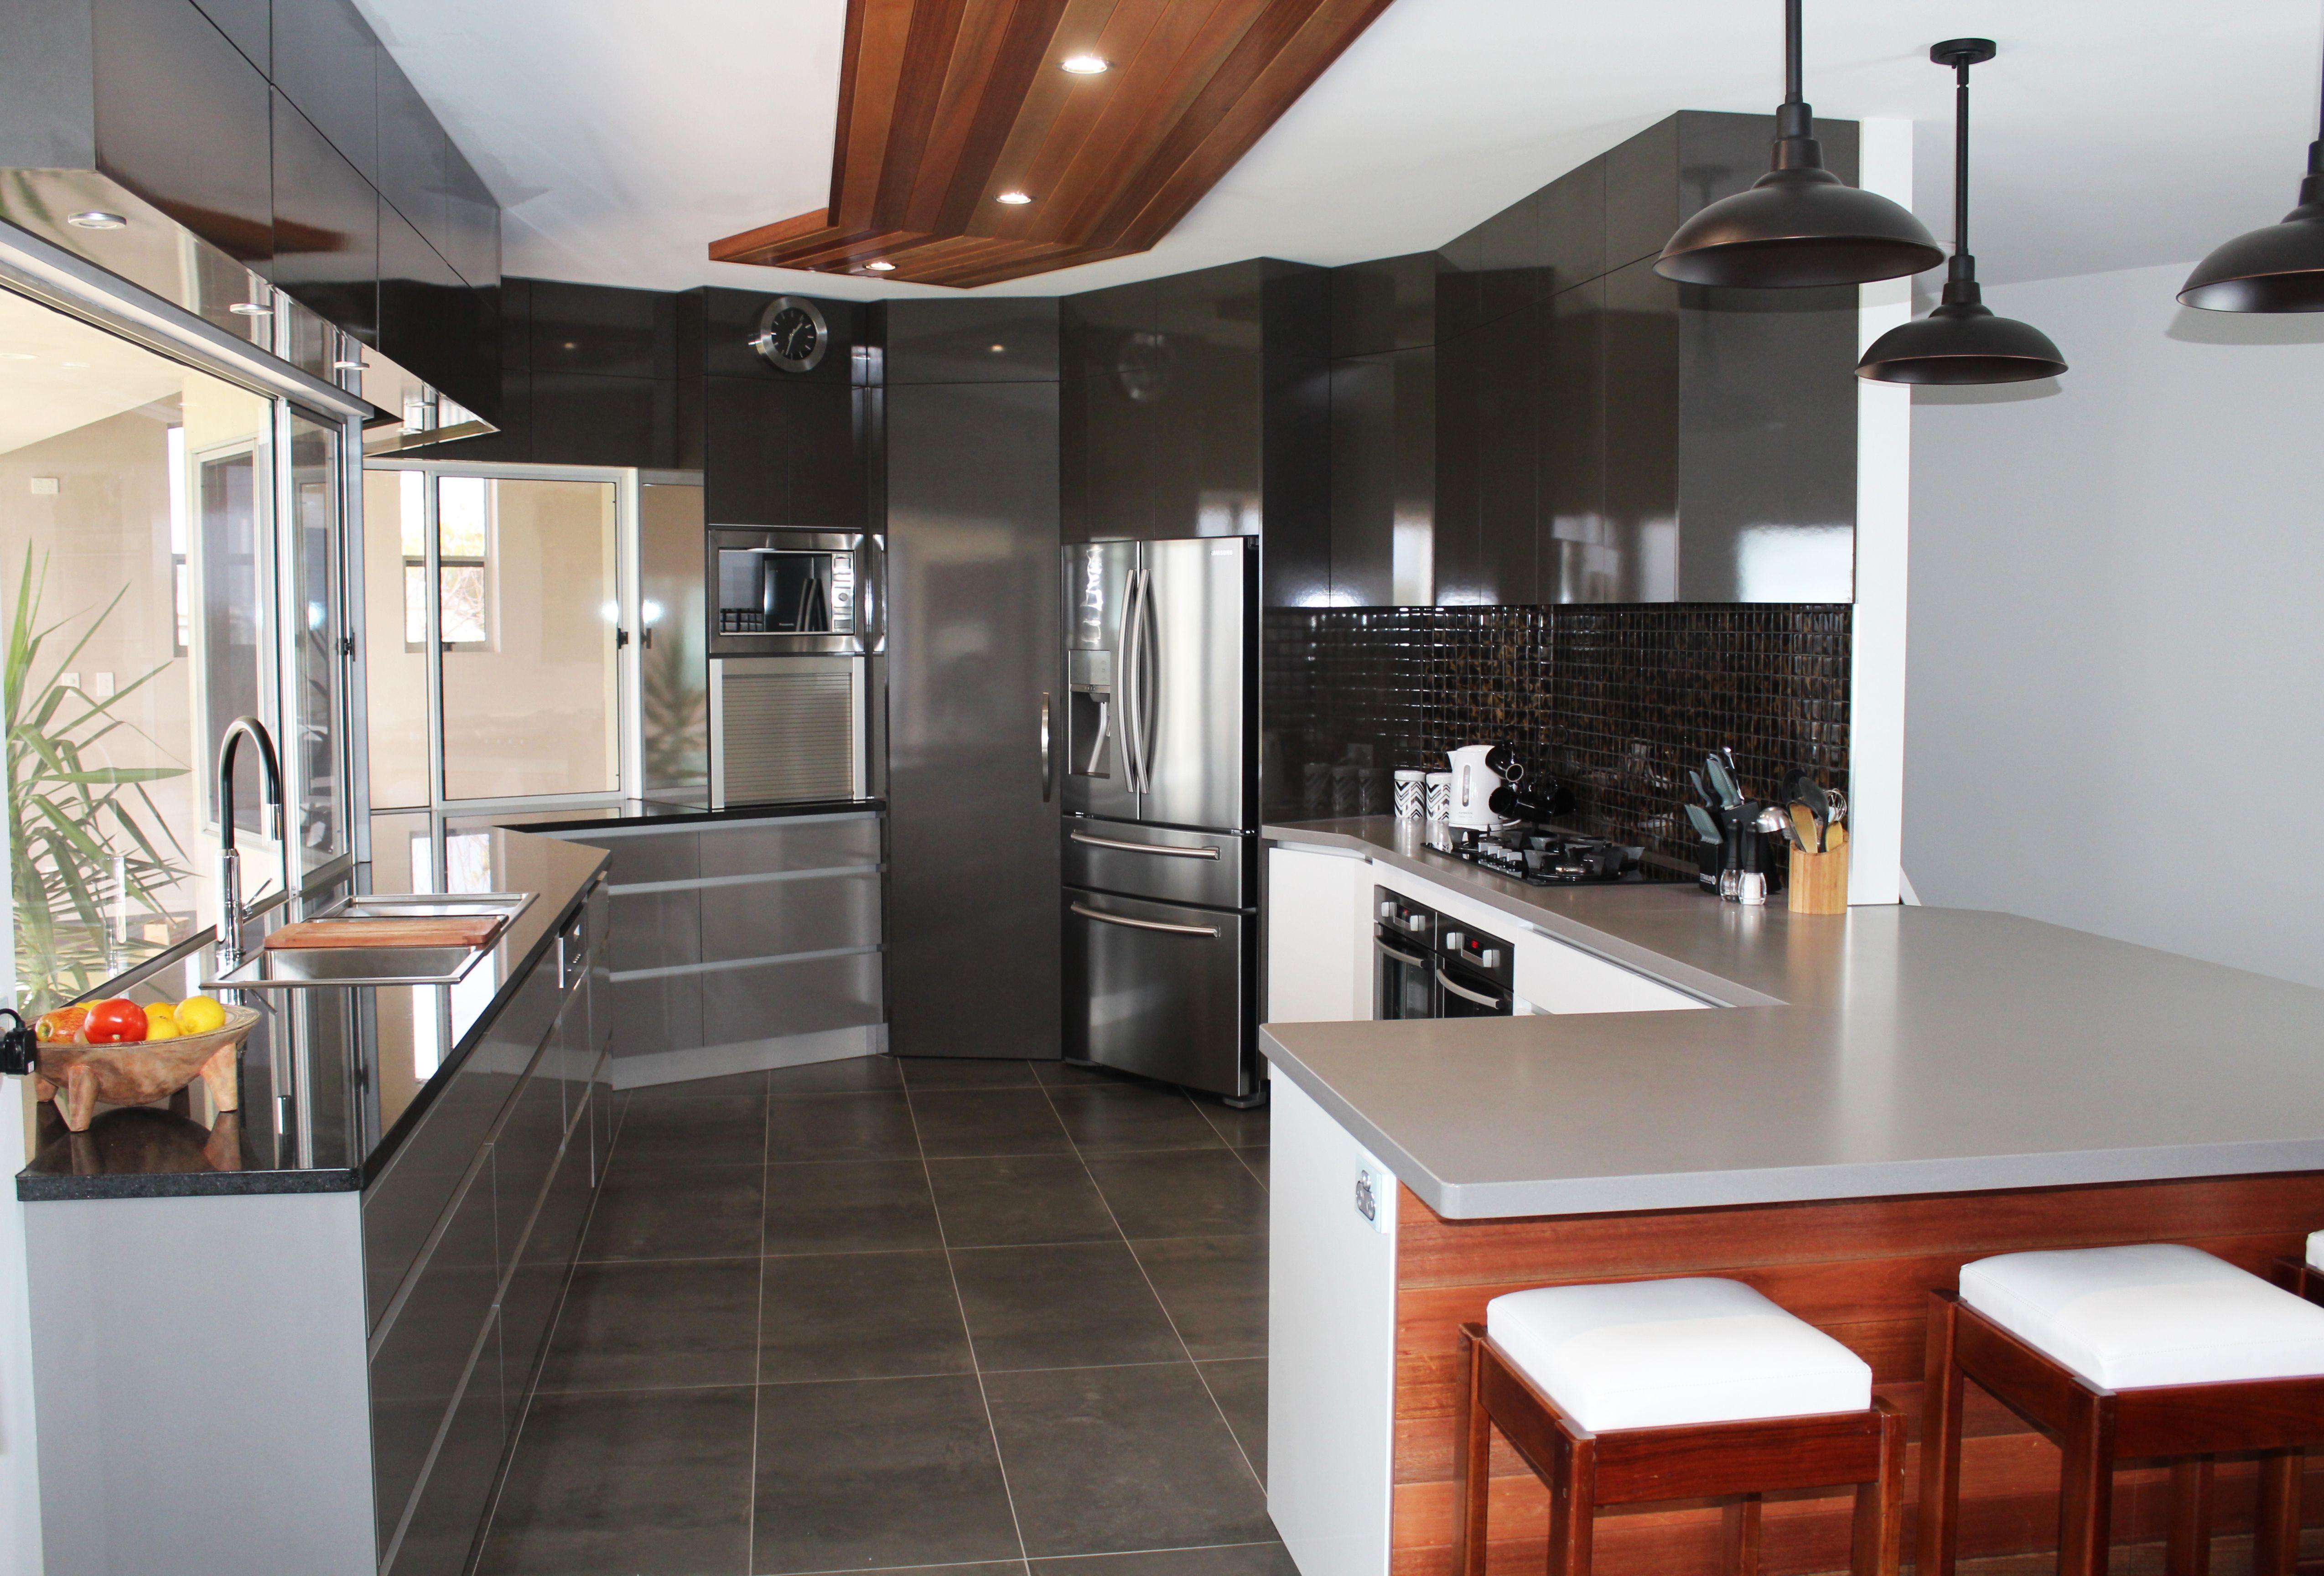 Cheap kitchen cabinets adelaide - Benchtops Adelaide Marble Black Granite Caesarstone Sleek Concrete Panels